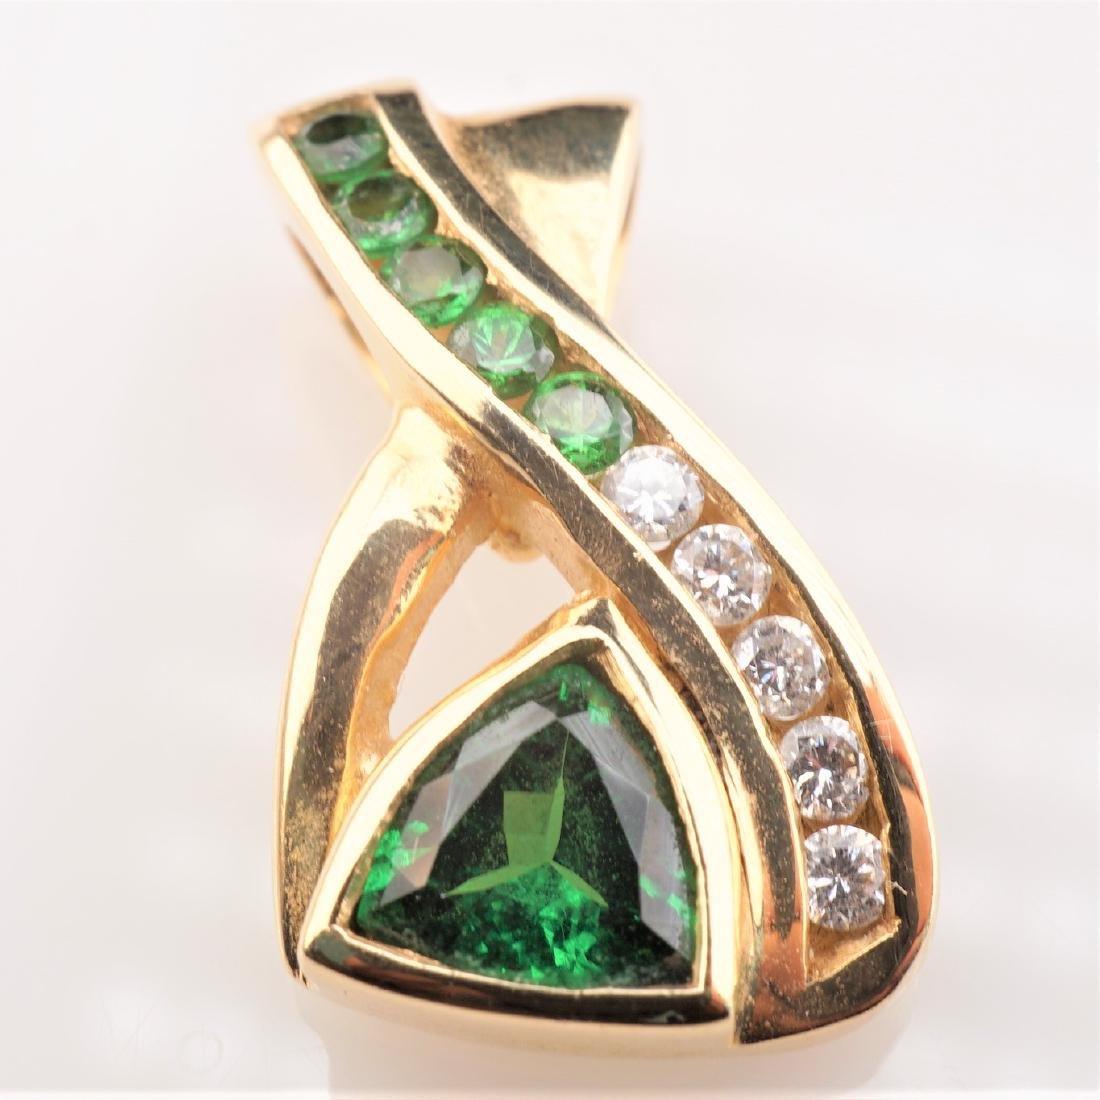 14k YG Trillion Cut Tsavorite Garnet and Diamond Pendan